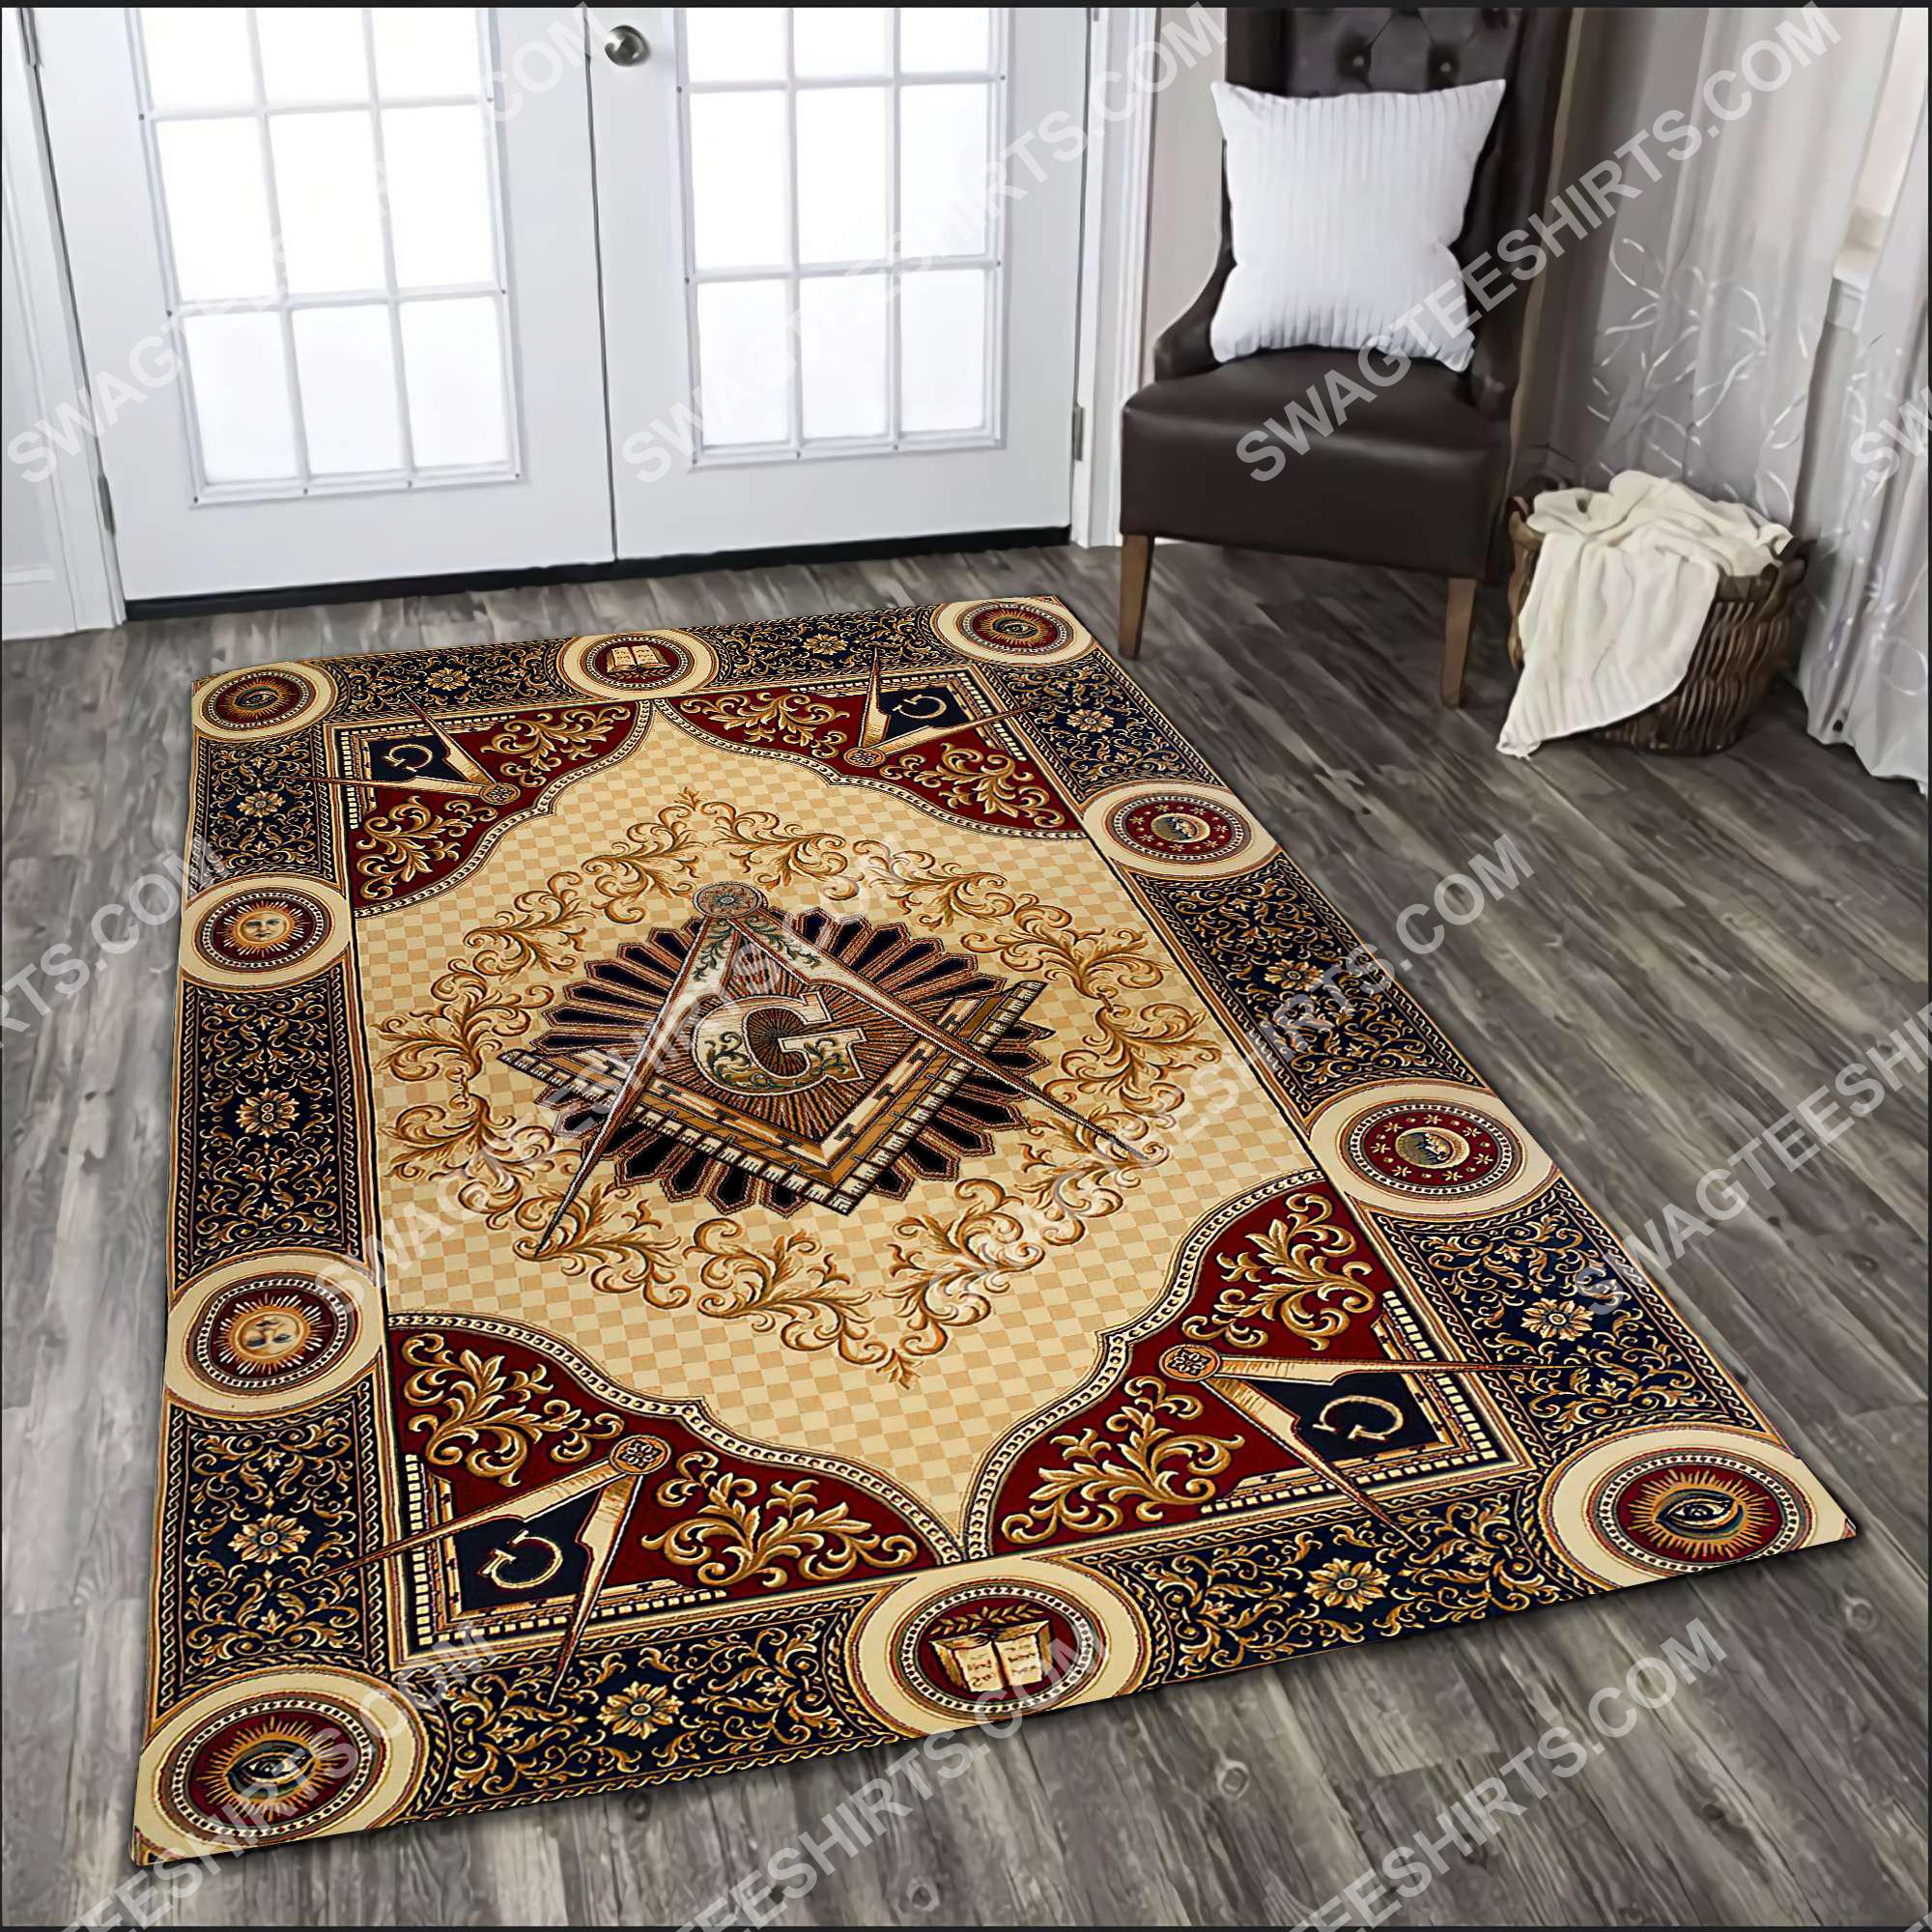 freemasonry masonic lodges all over printed rug 3(1) - Copy